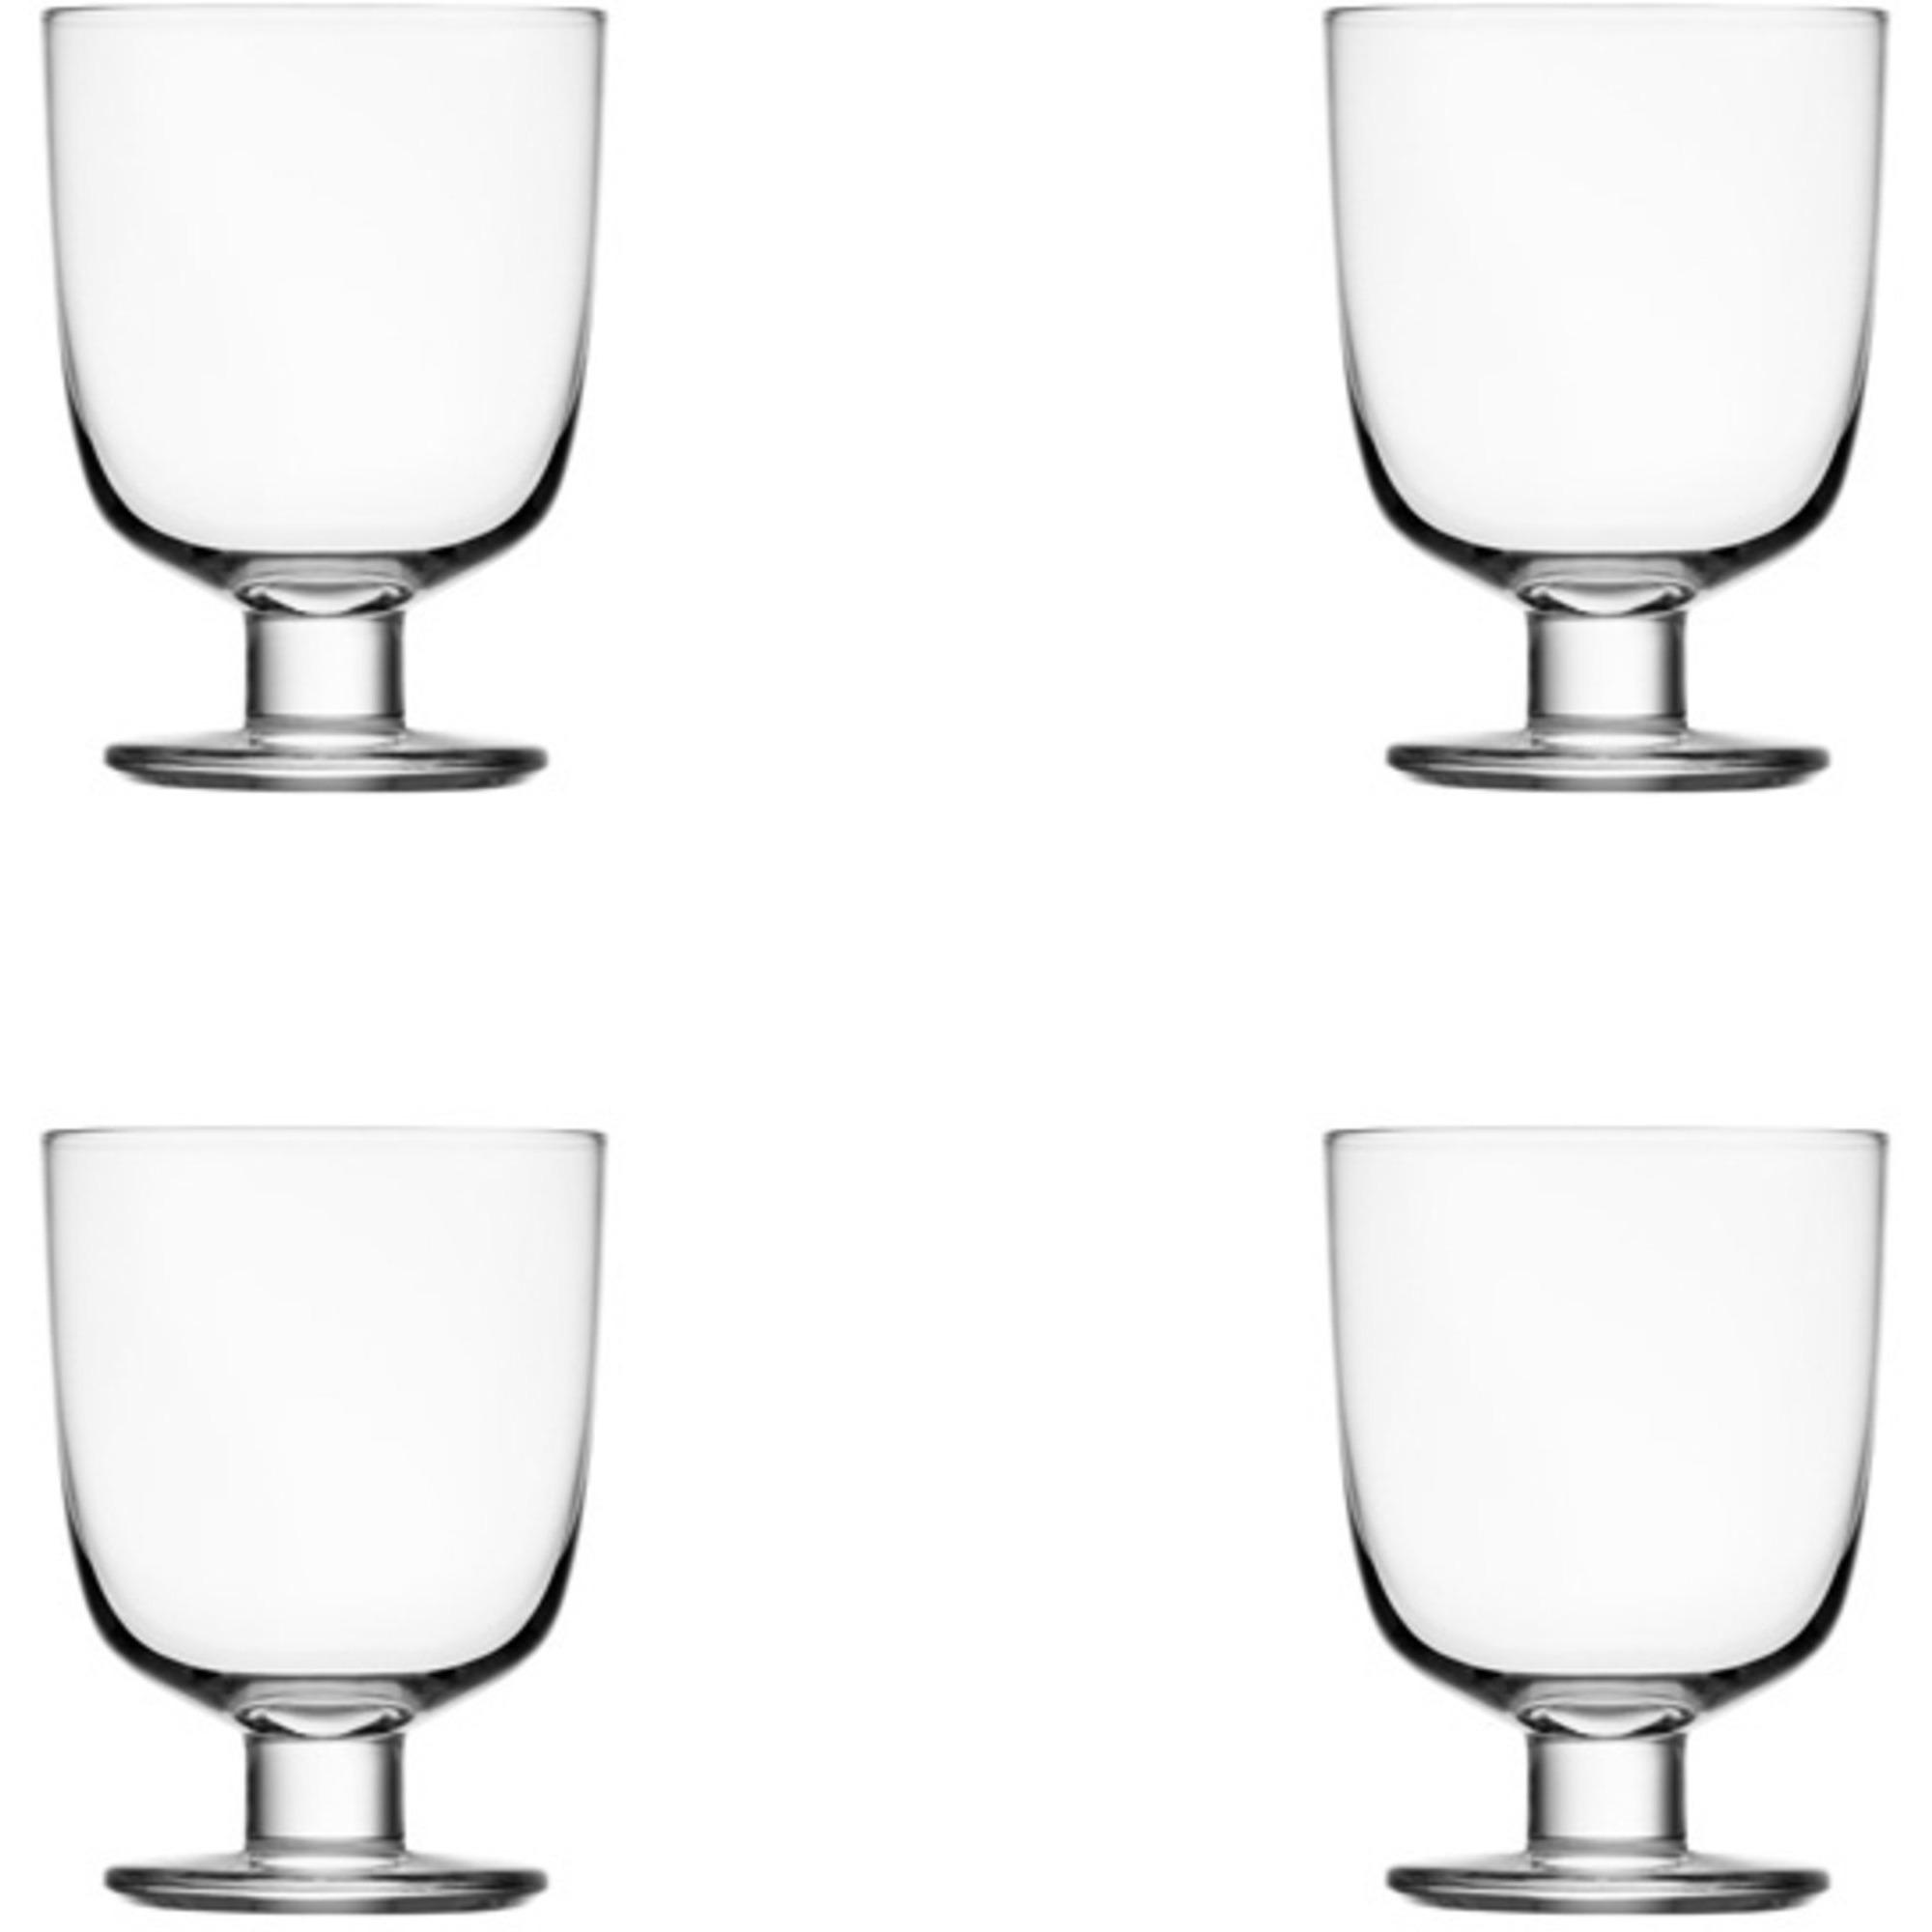 Iittala Lempi Glas 34 cl Klar 4 st